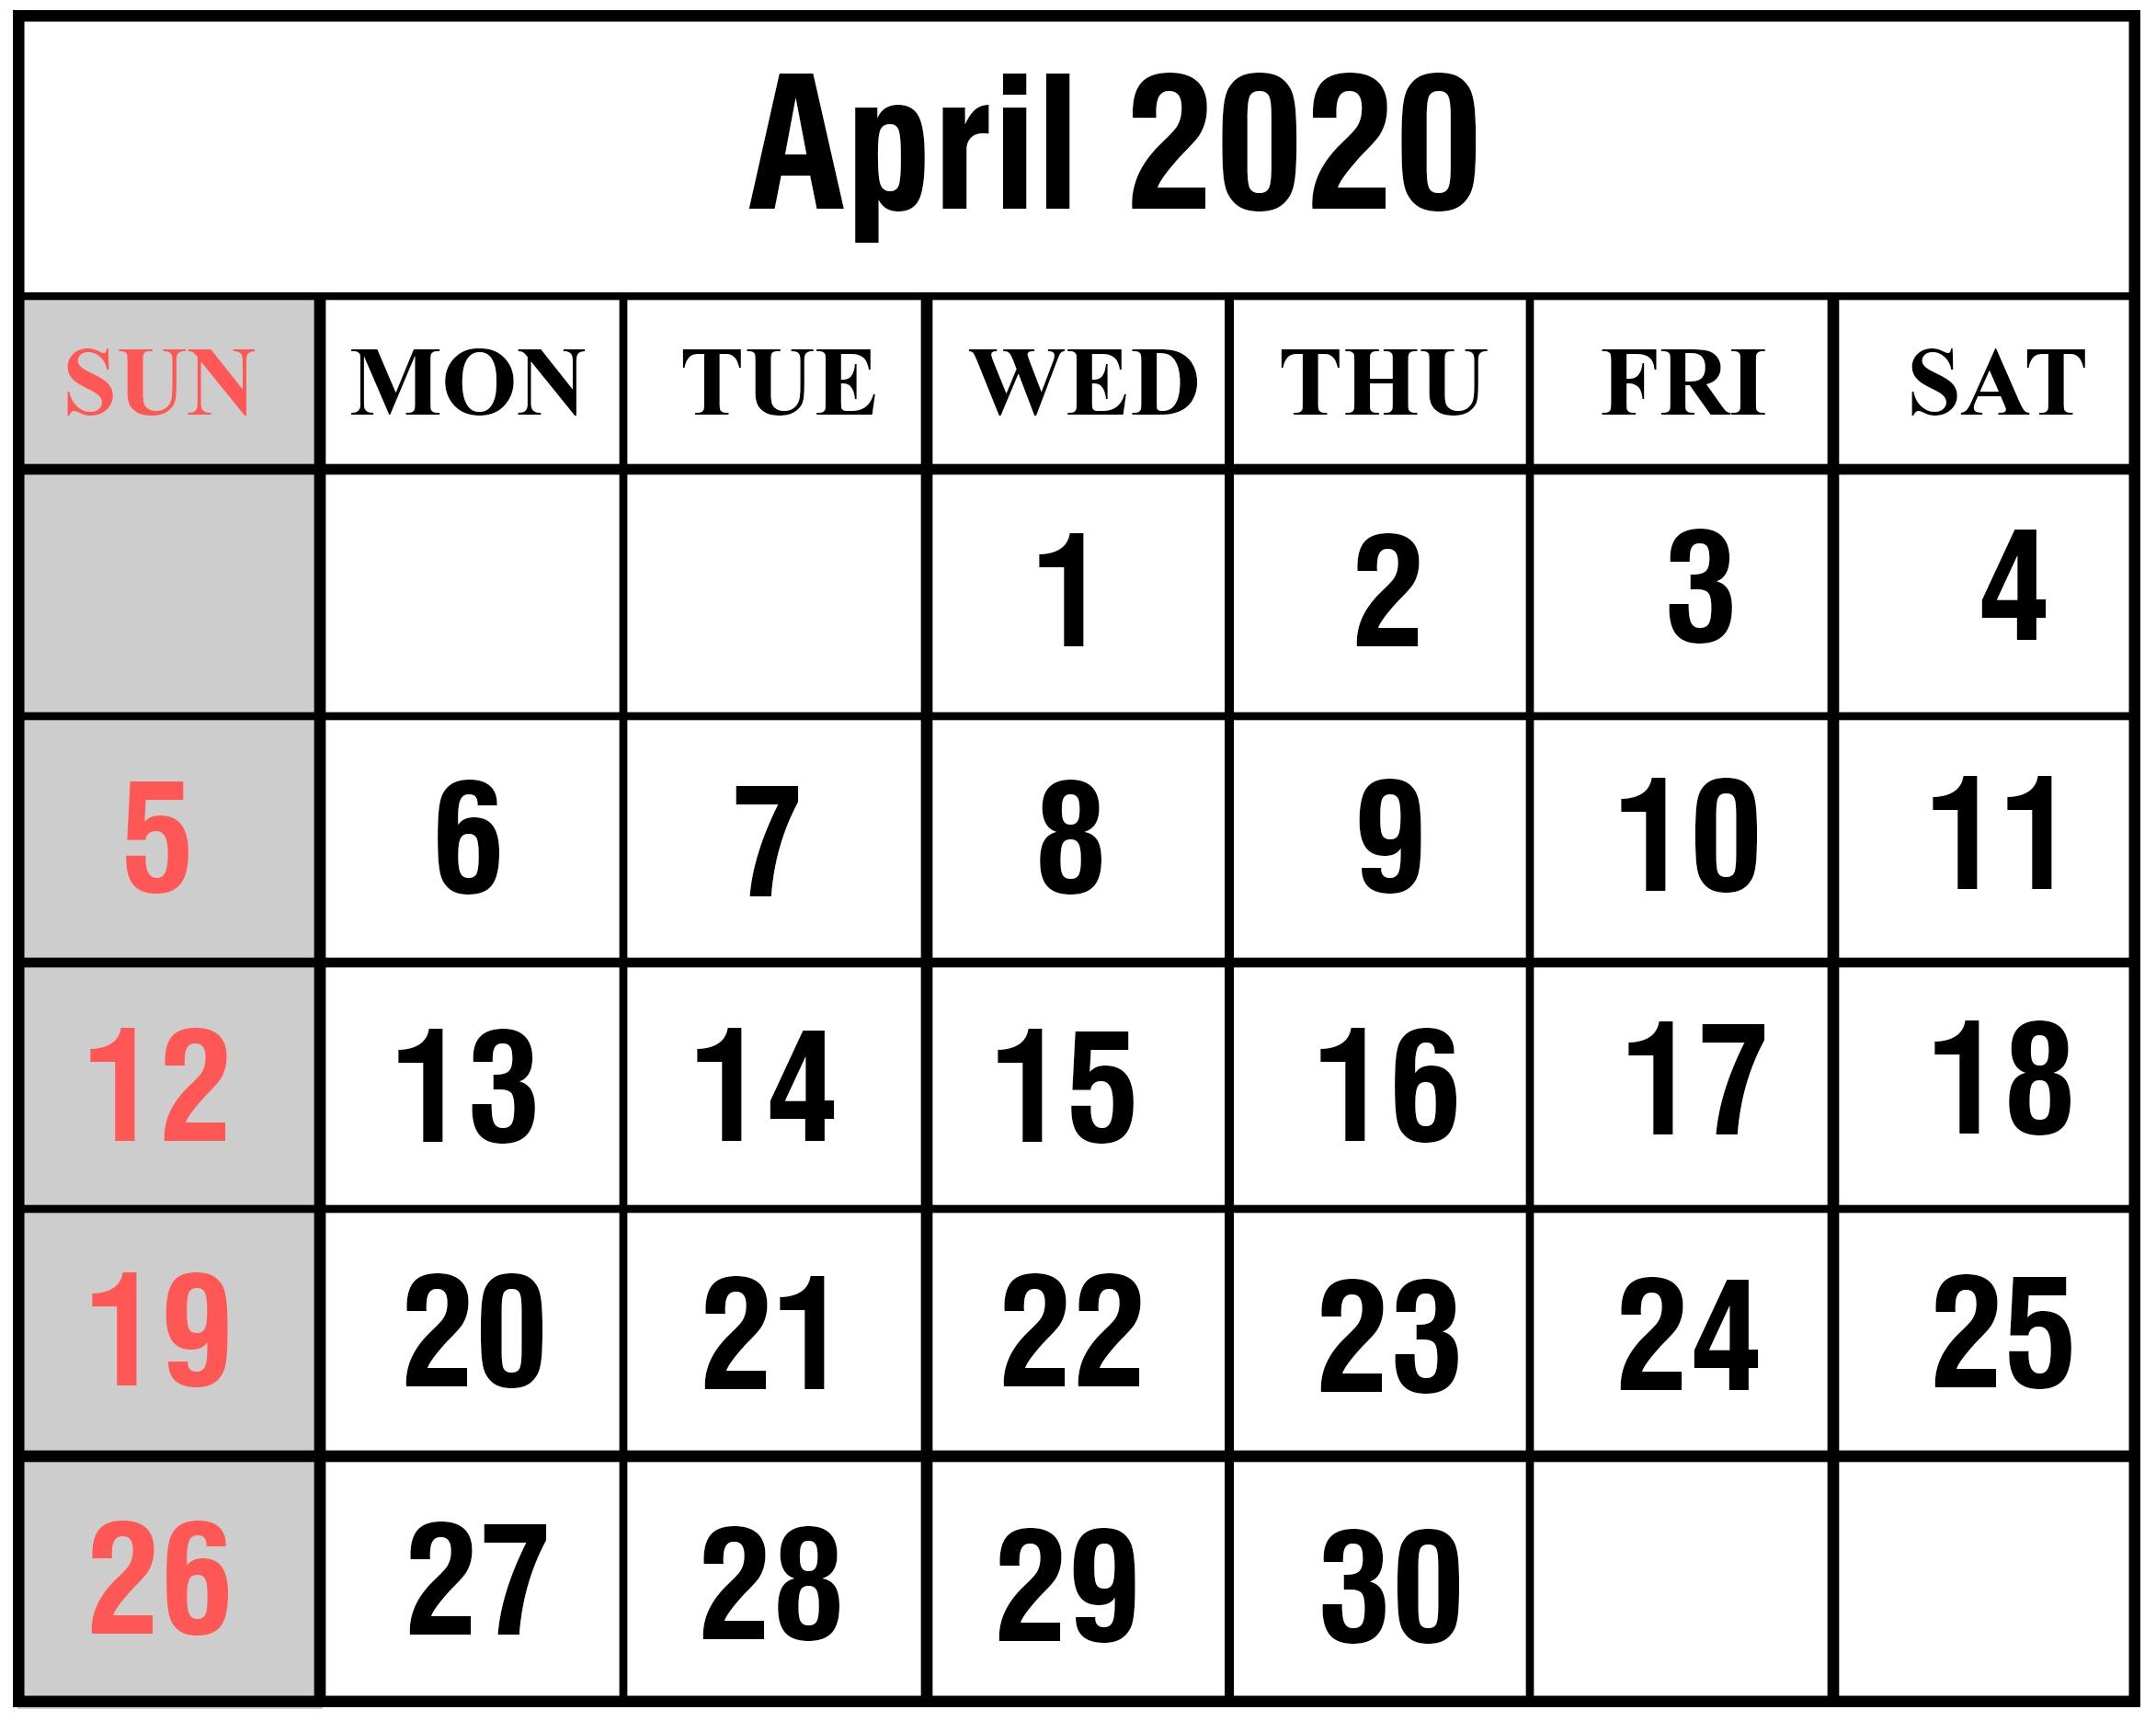 April 2020 Calendar Printable | Monthly Calendar Template